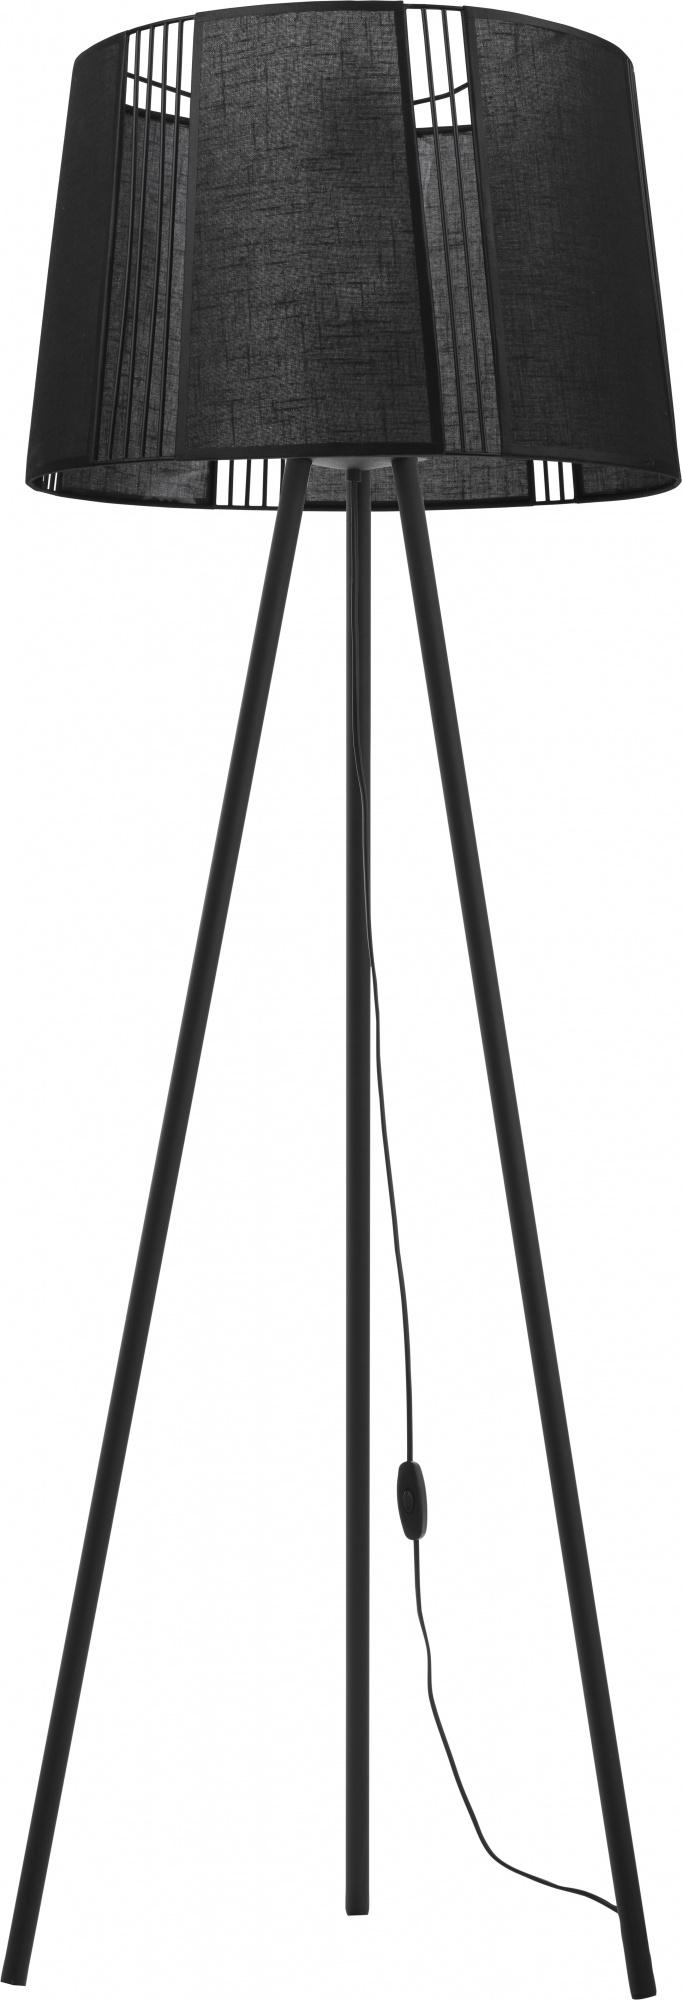 TK Lighting TK-5162 Carmen állólámpa